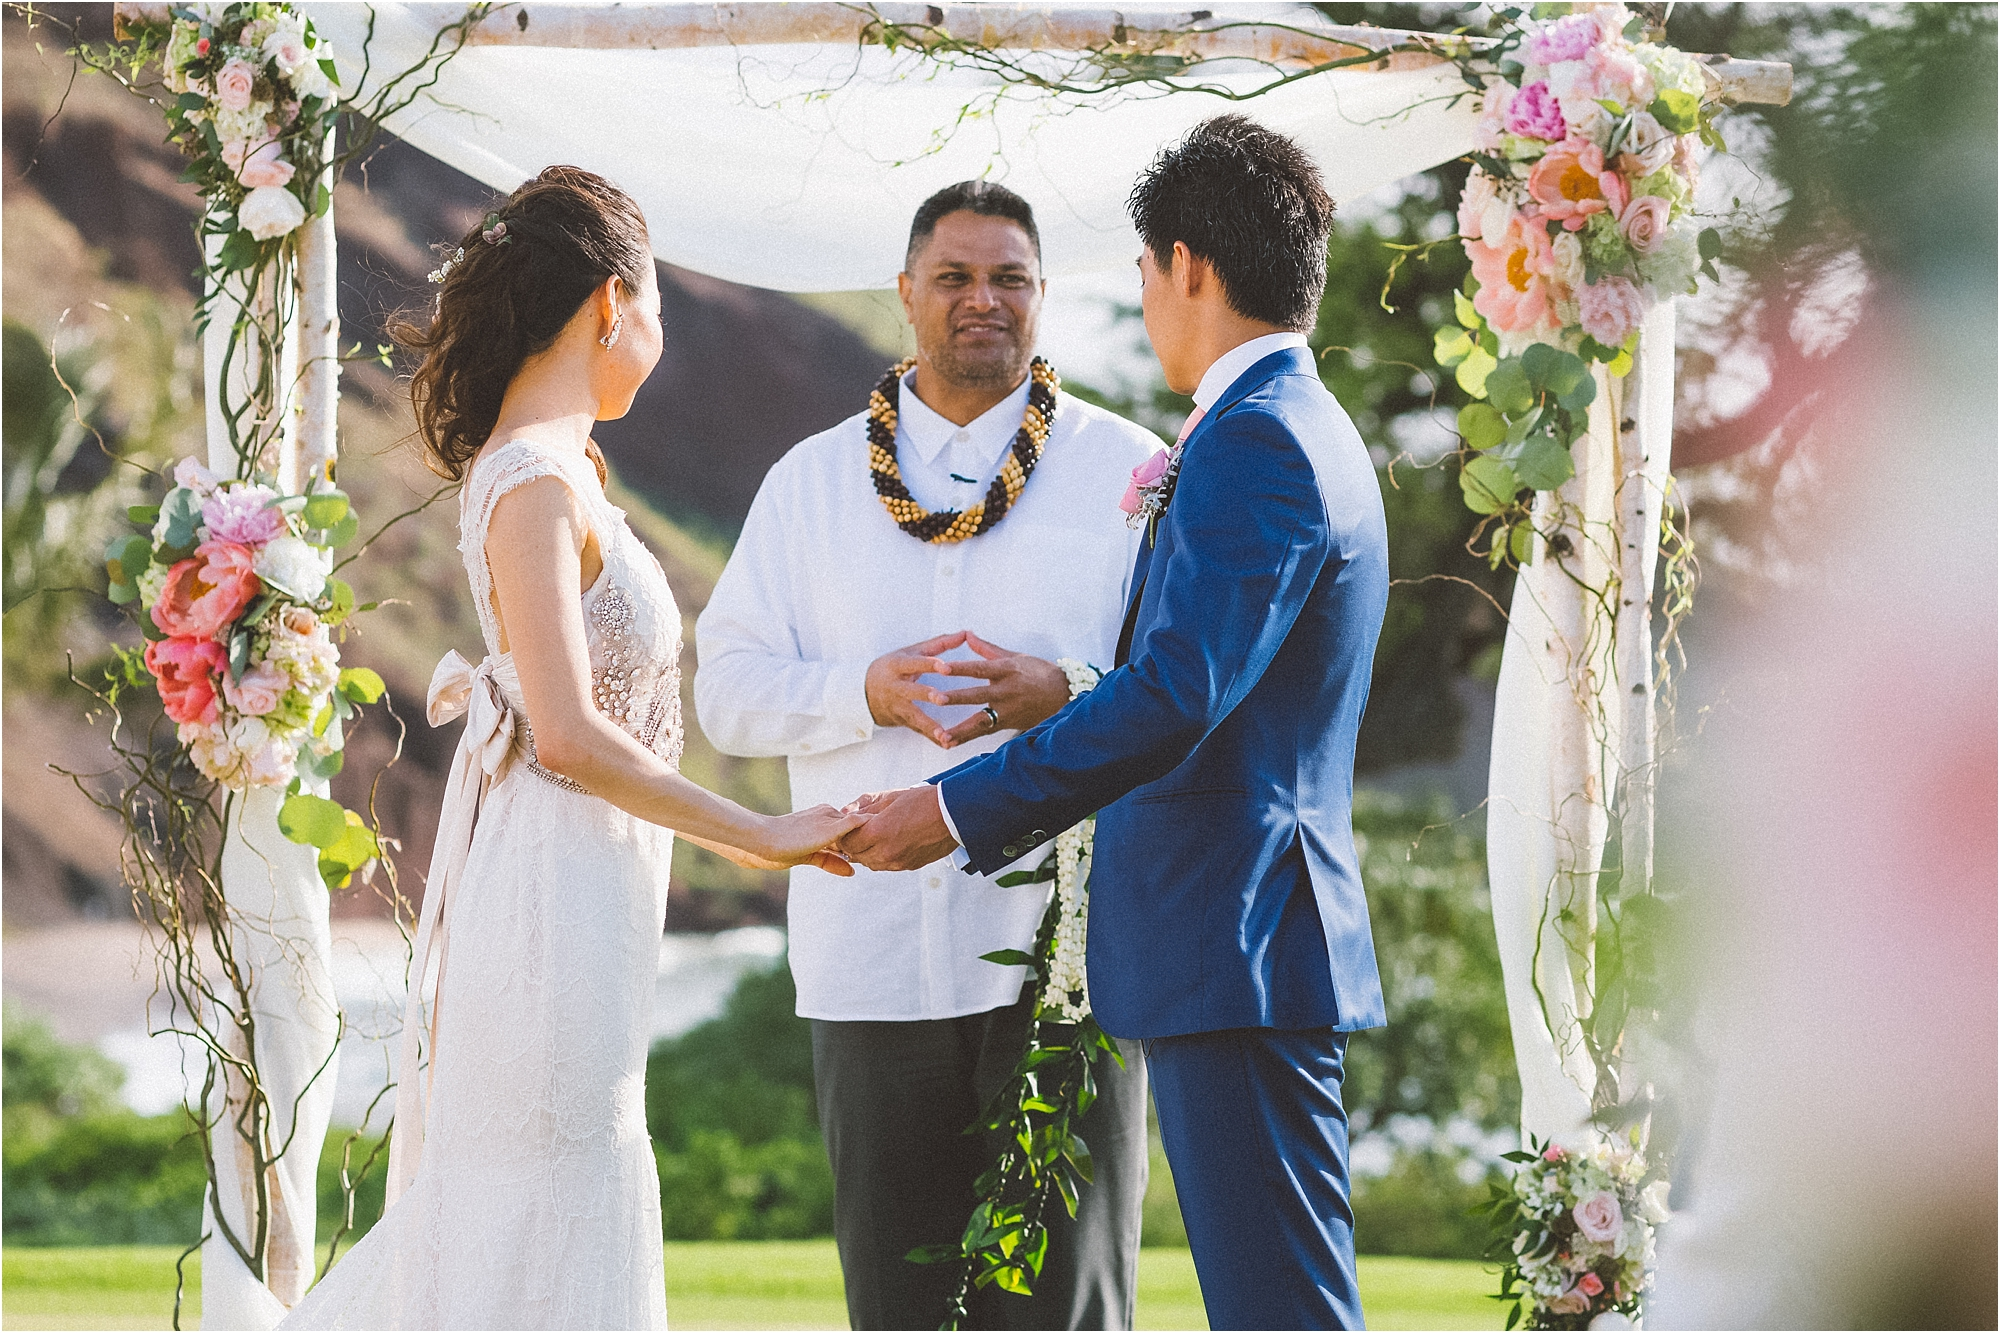 angie-diaz-photography-maui-hawaii-destination-wedding-makena-golf-beach-club_0026.jpg